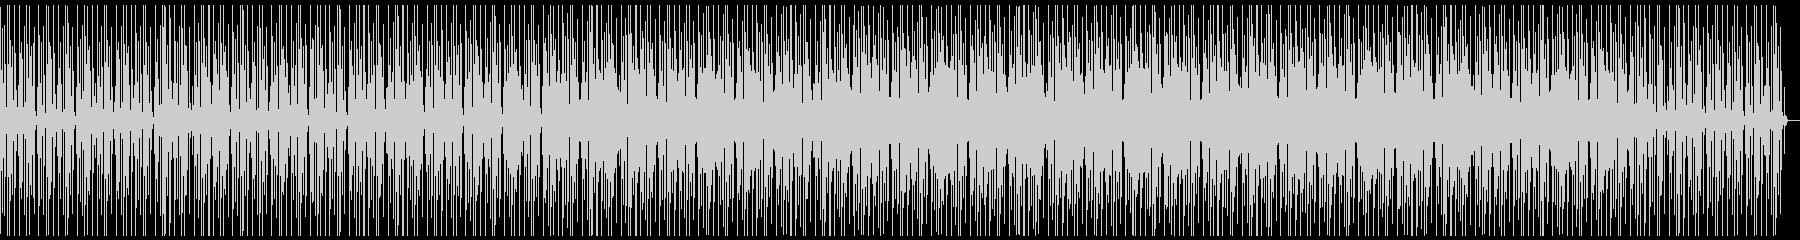 528Hz日常のストレス解放の瞑想曲1の未再生の波形